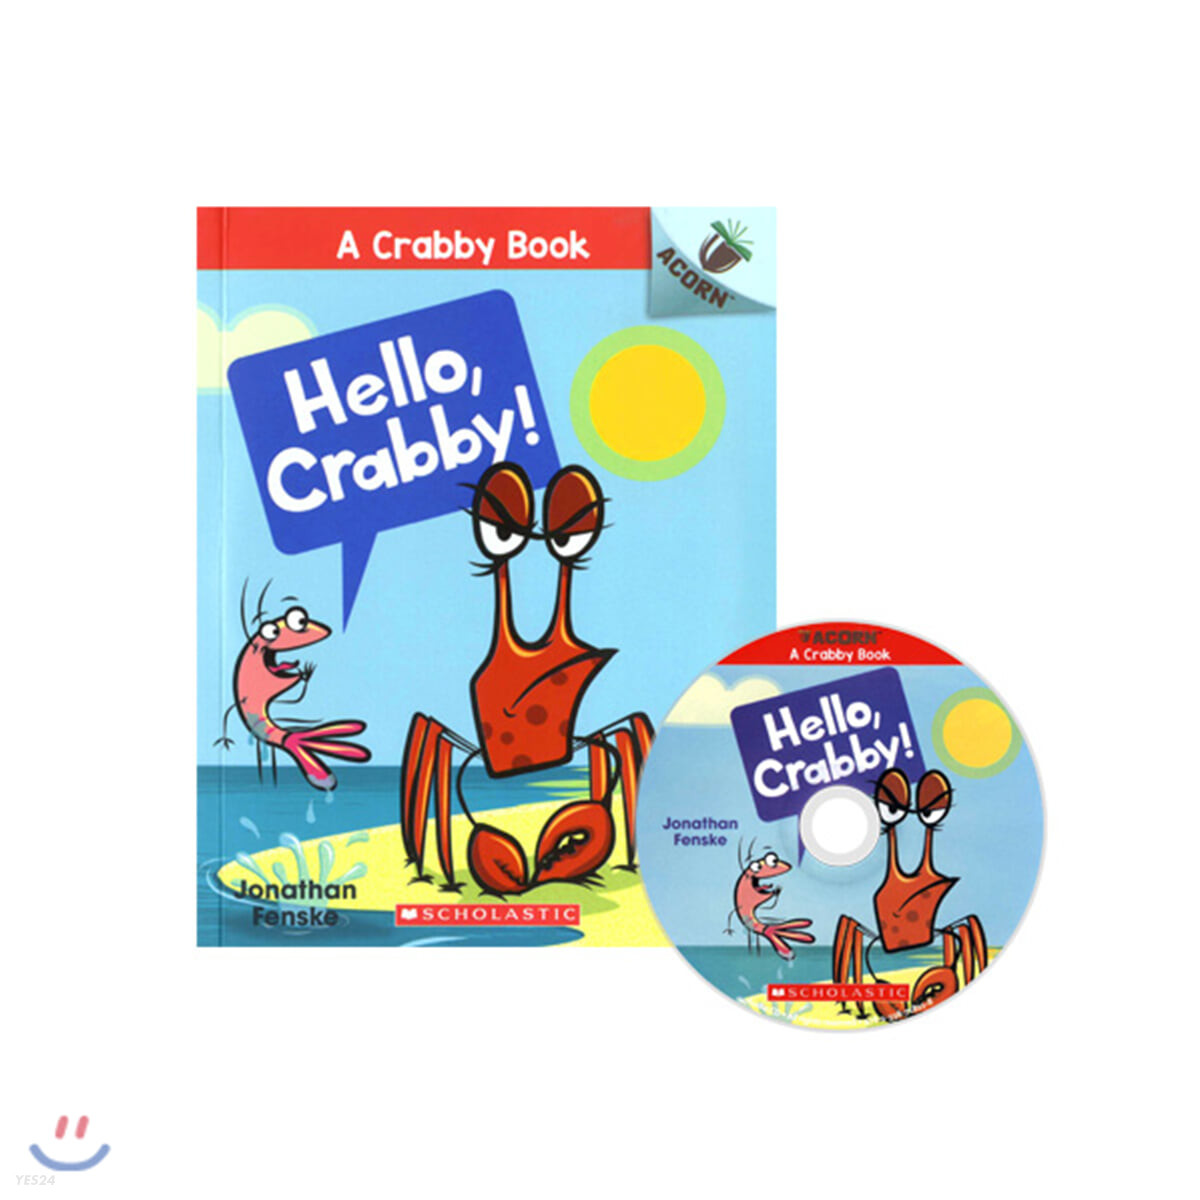 A Crabby Book #1: Hello, Crabby! (CD & StoryPlus)